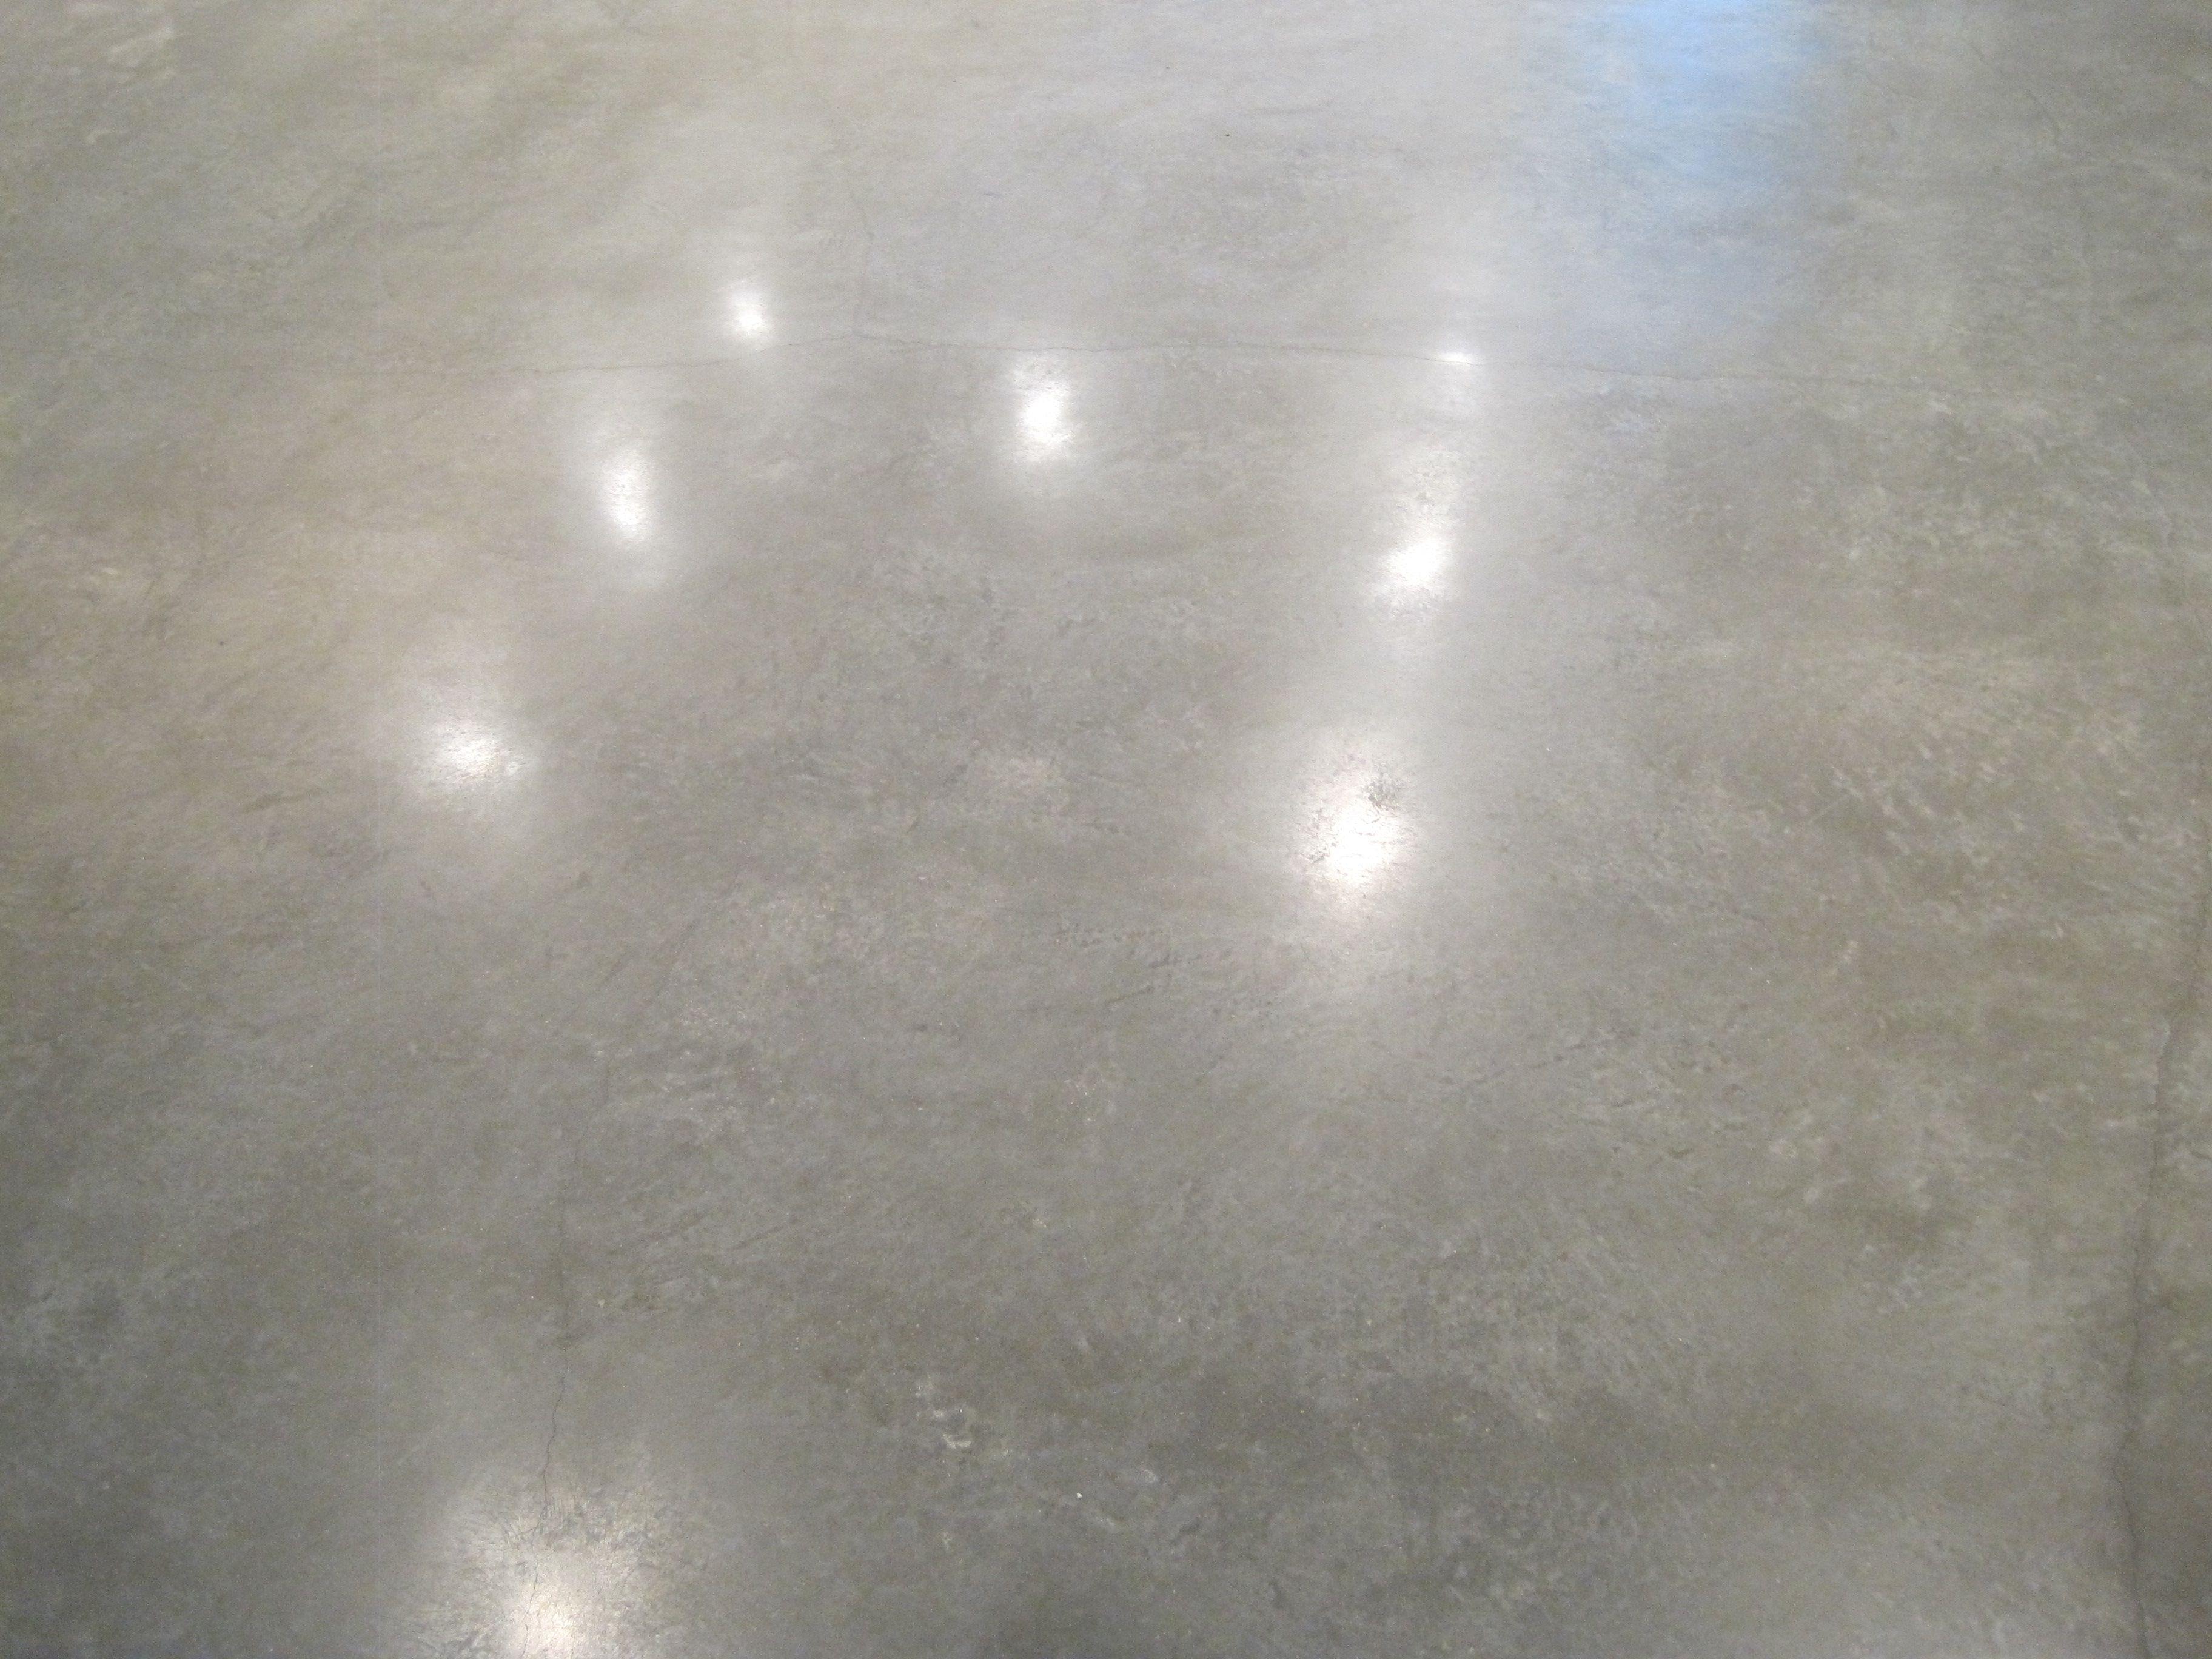 pic floor like in leader bands pc polishedcrete polished uncategorized gallery bart concrete connector